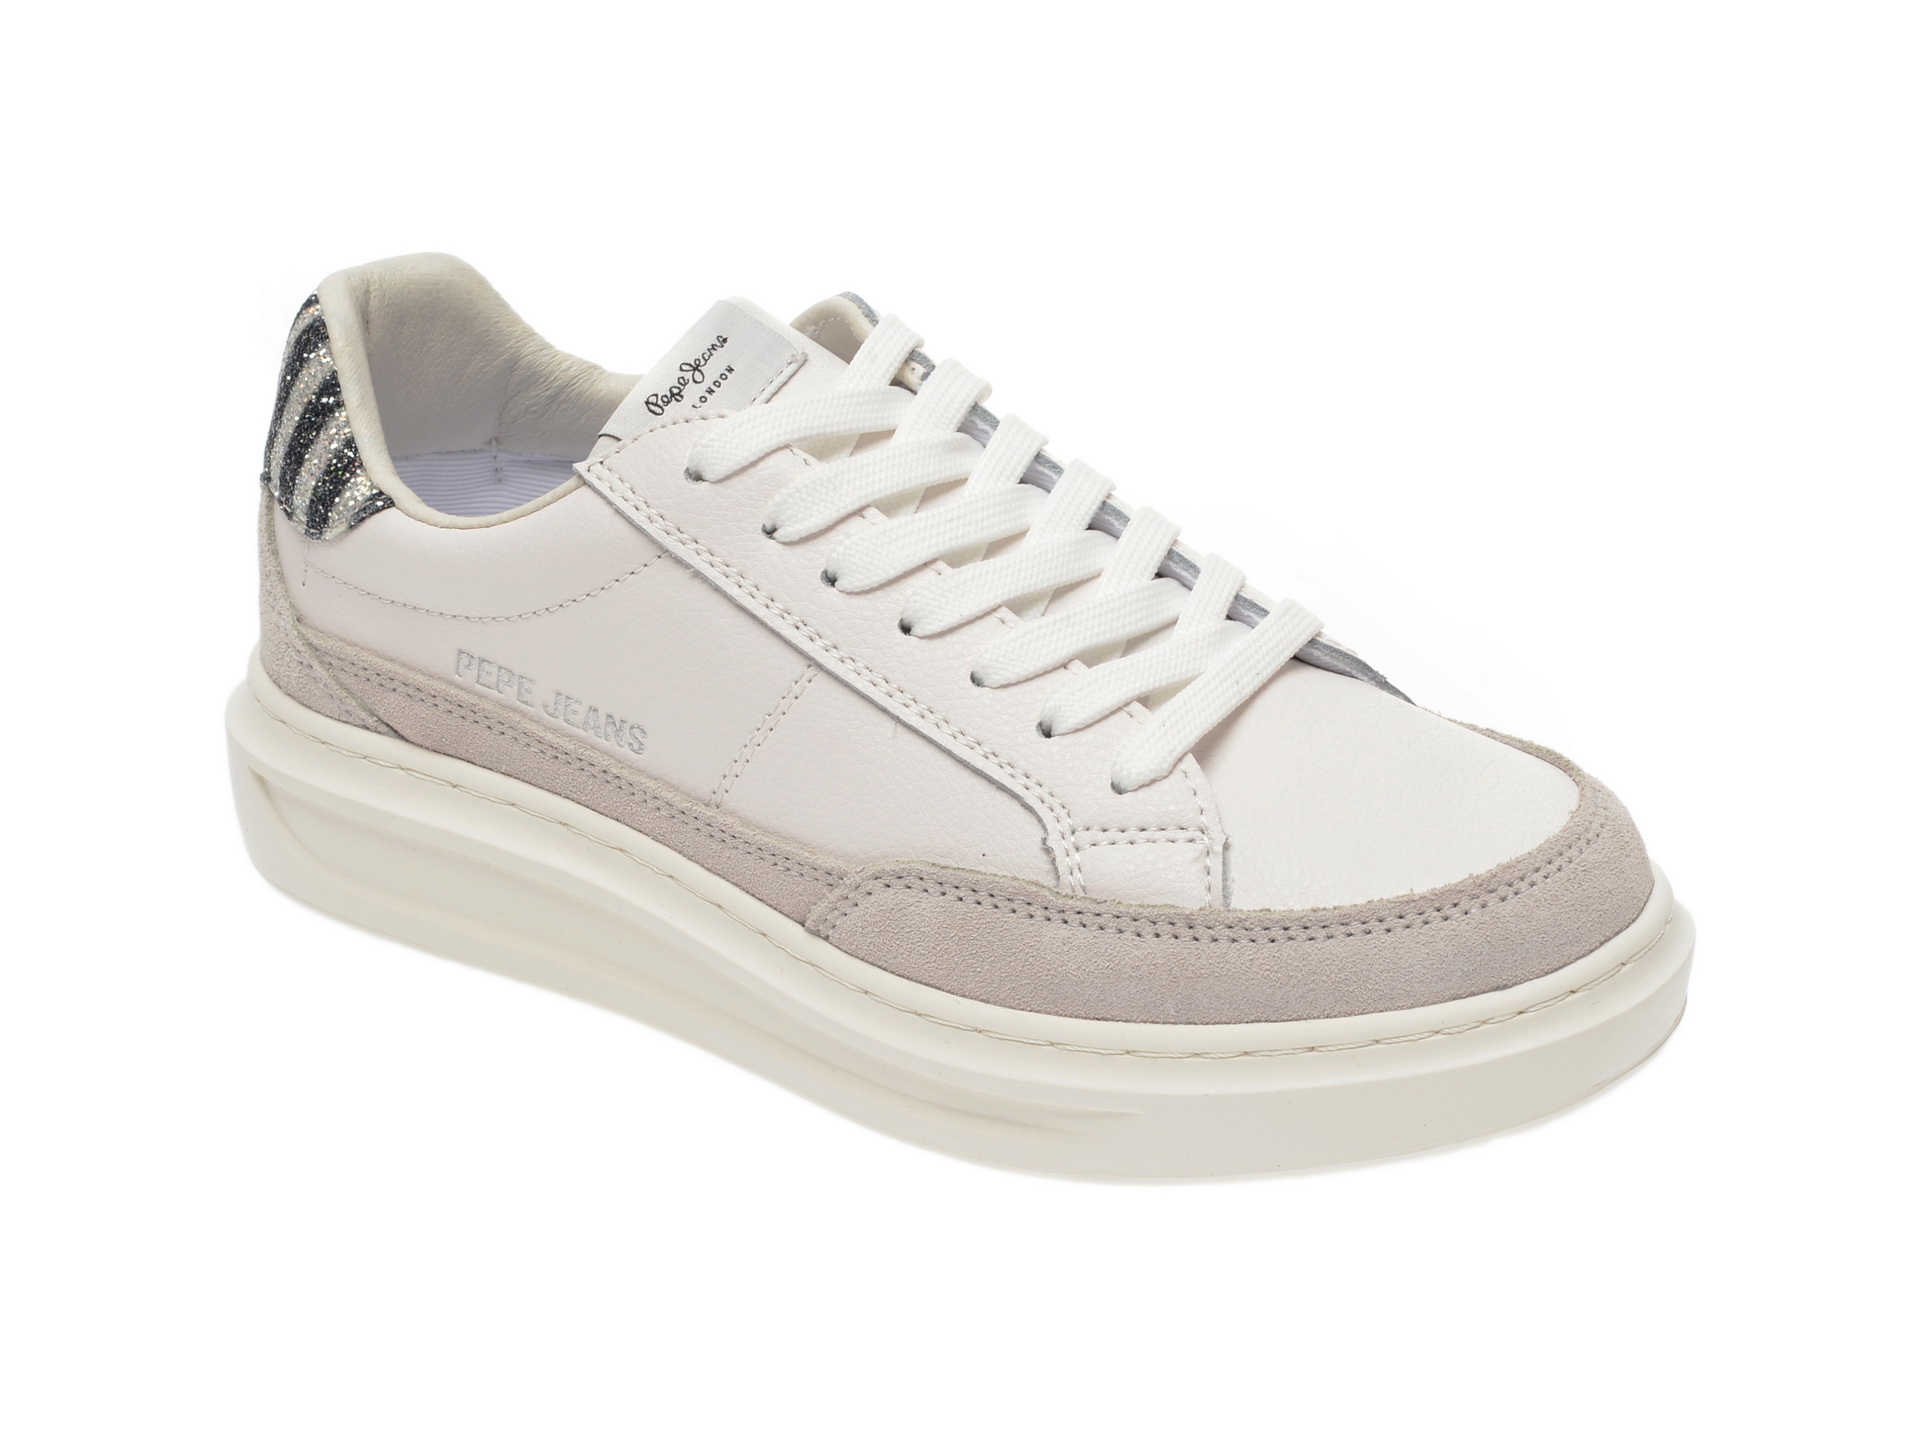 Pantofi sport PEPE JEANS albi, LS30964, din piele naturala New